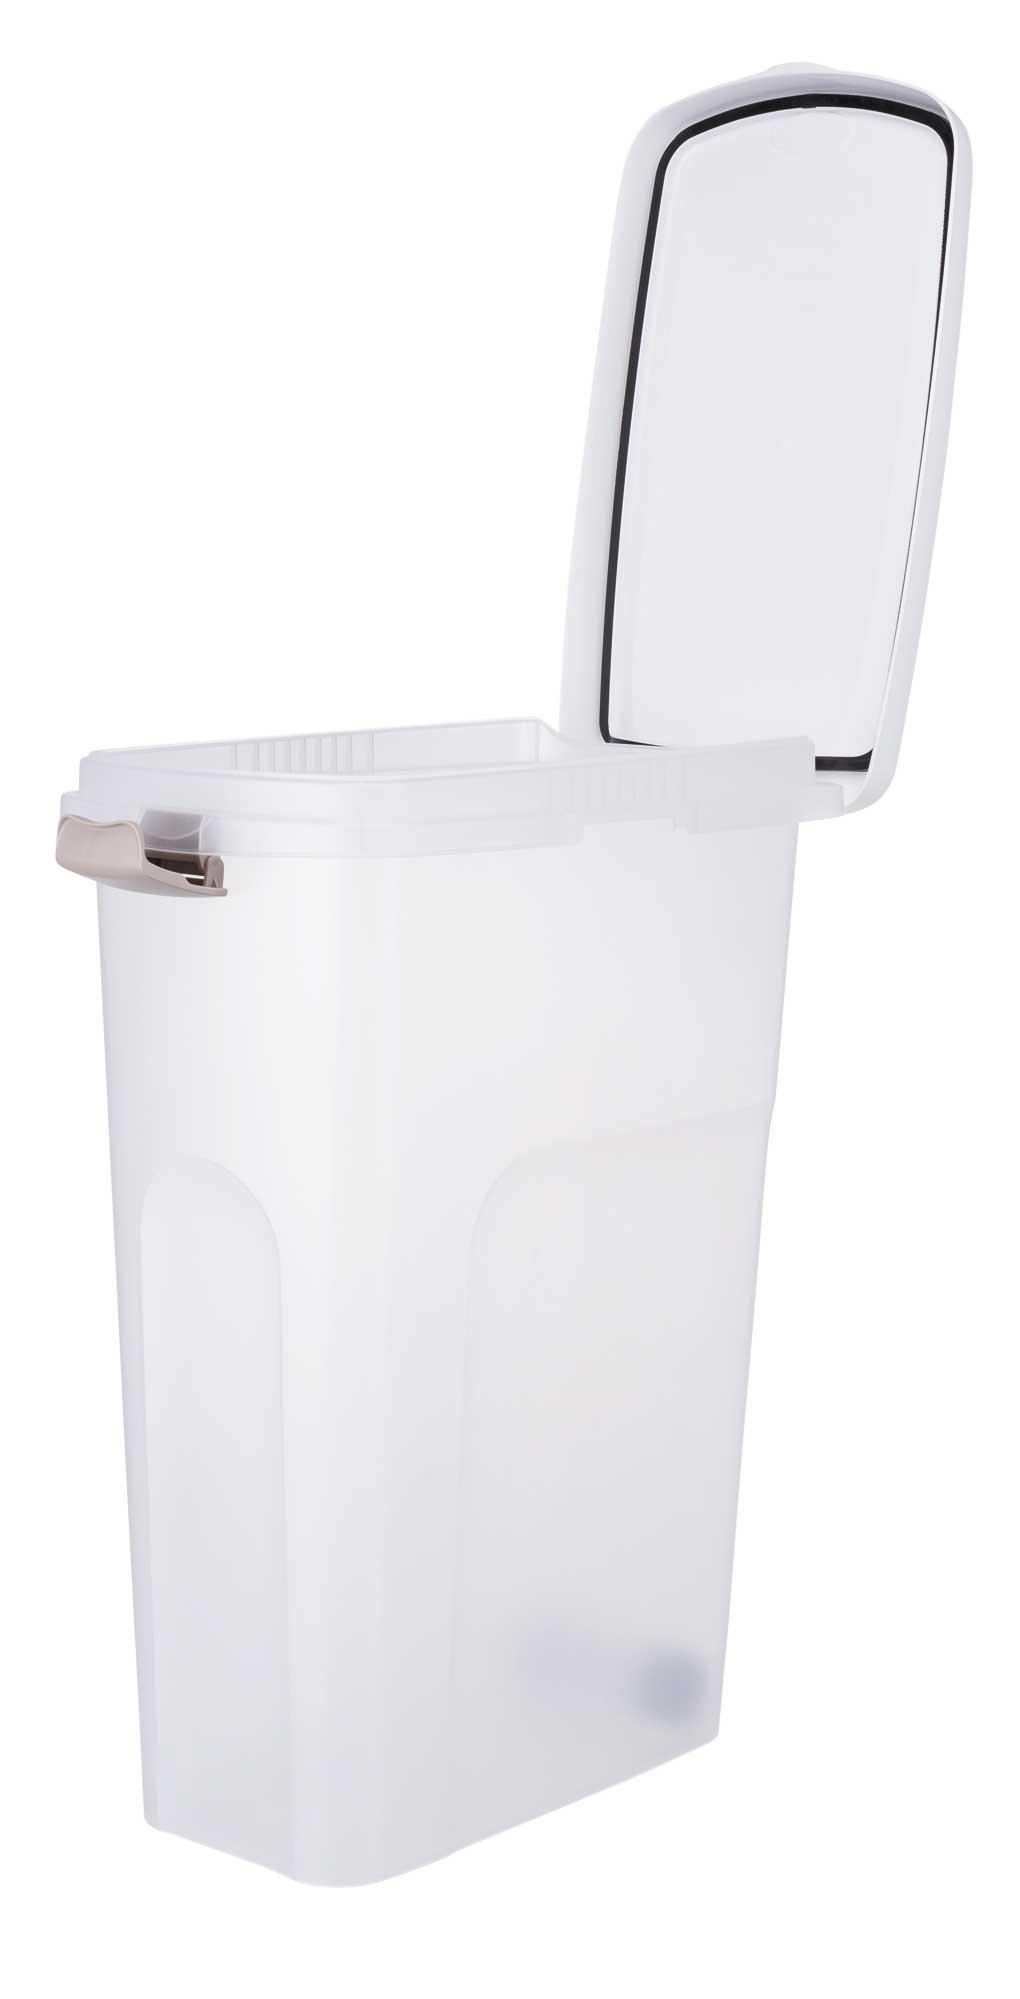 TRIXIE Futtertonne TRIXIE Tonne, luftdicht verschließbar, Kunststoff, 40 l/27 × 61 × 45 cm, transparent-we